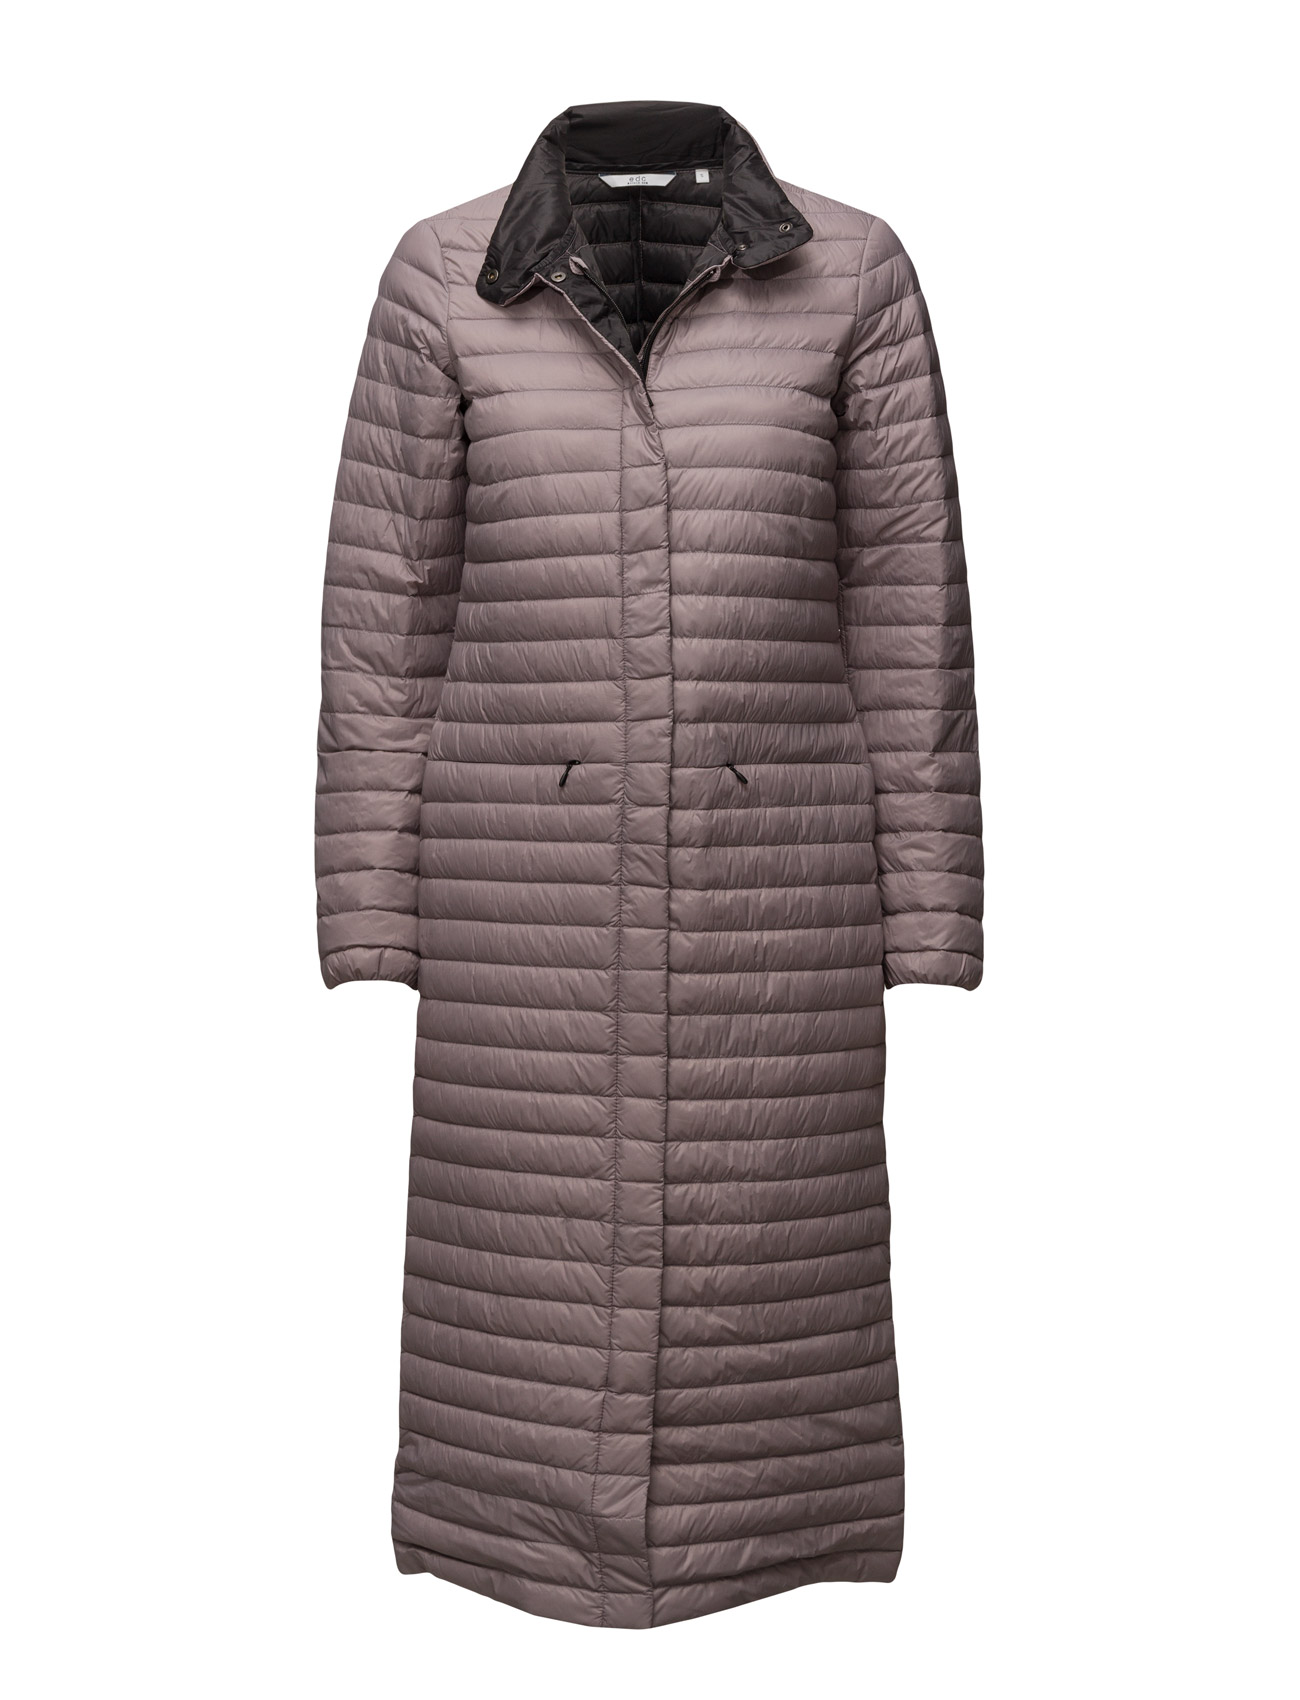 Bedre Kvalitet Herre Coats Woven Esprit Casual DARK KHAKI